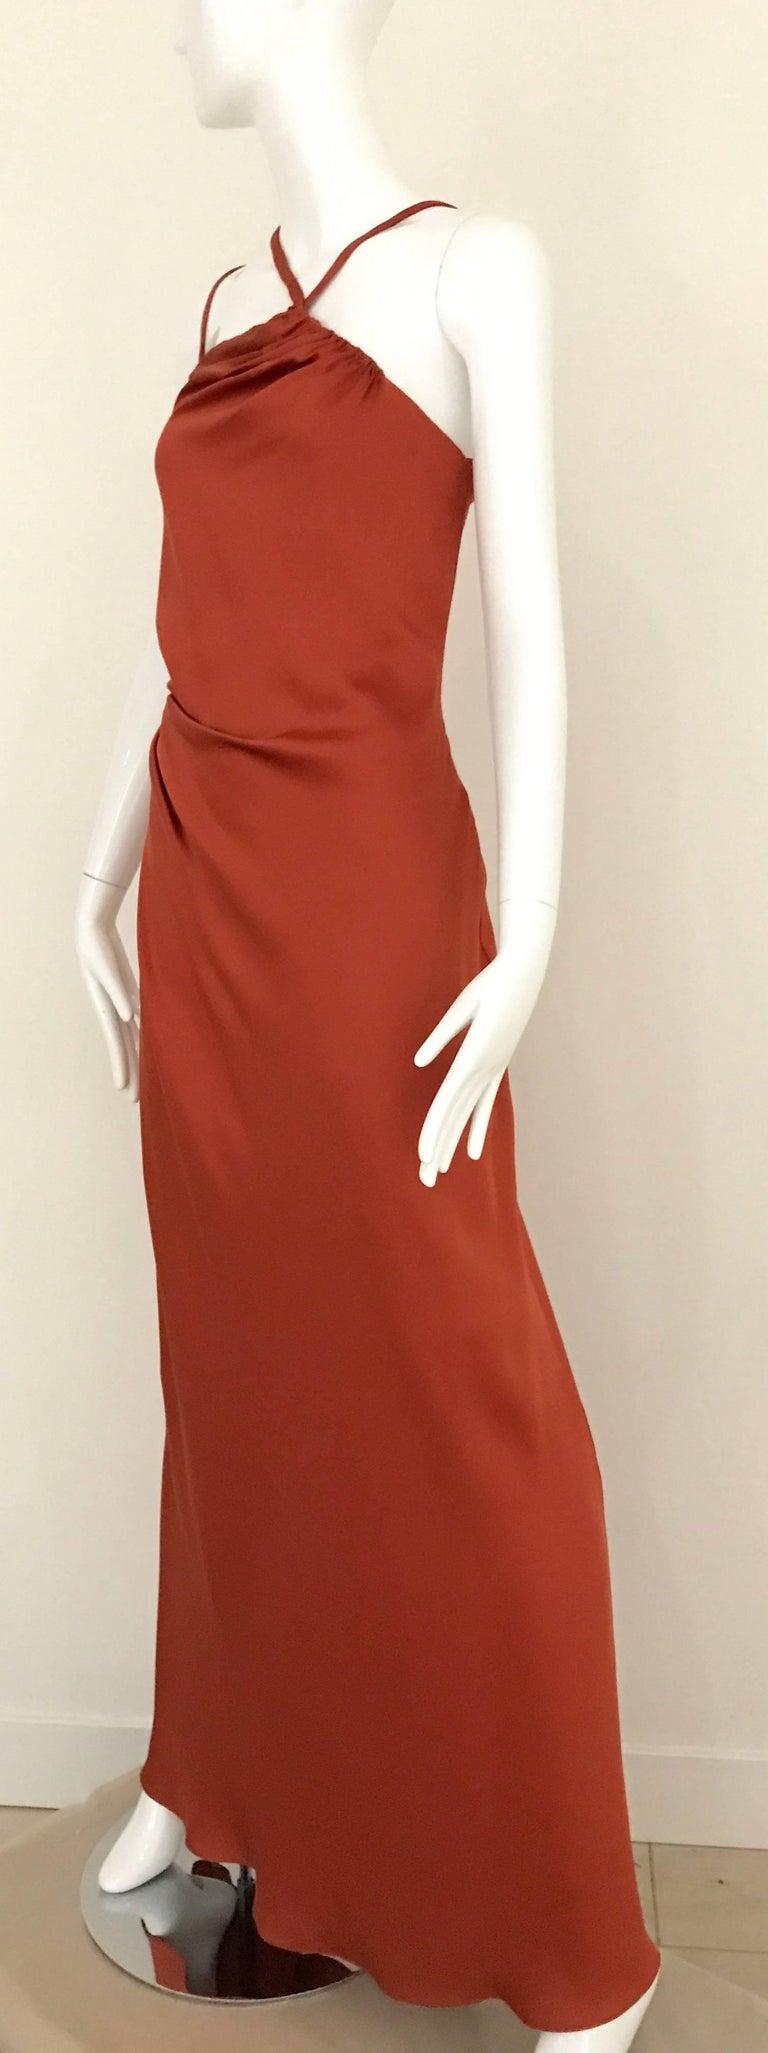 Red 1990s BILL BLASS Burnt Orange Silk Charmeuse Asymetrical Neckline Dress For Sale